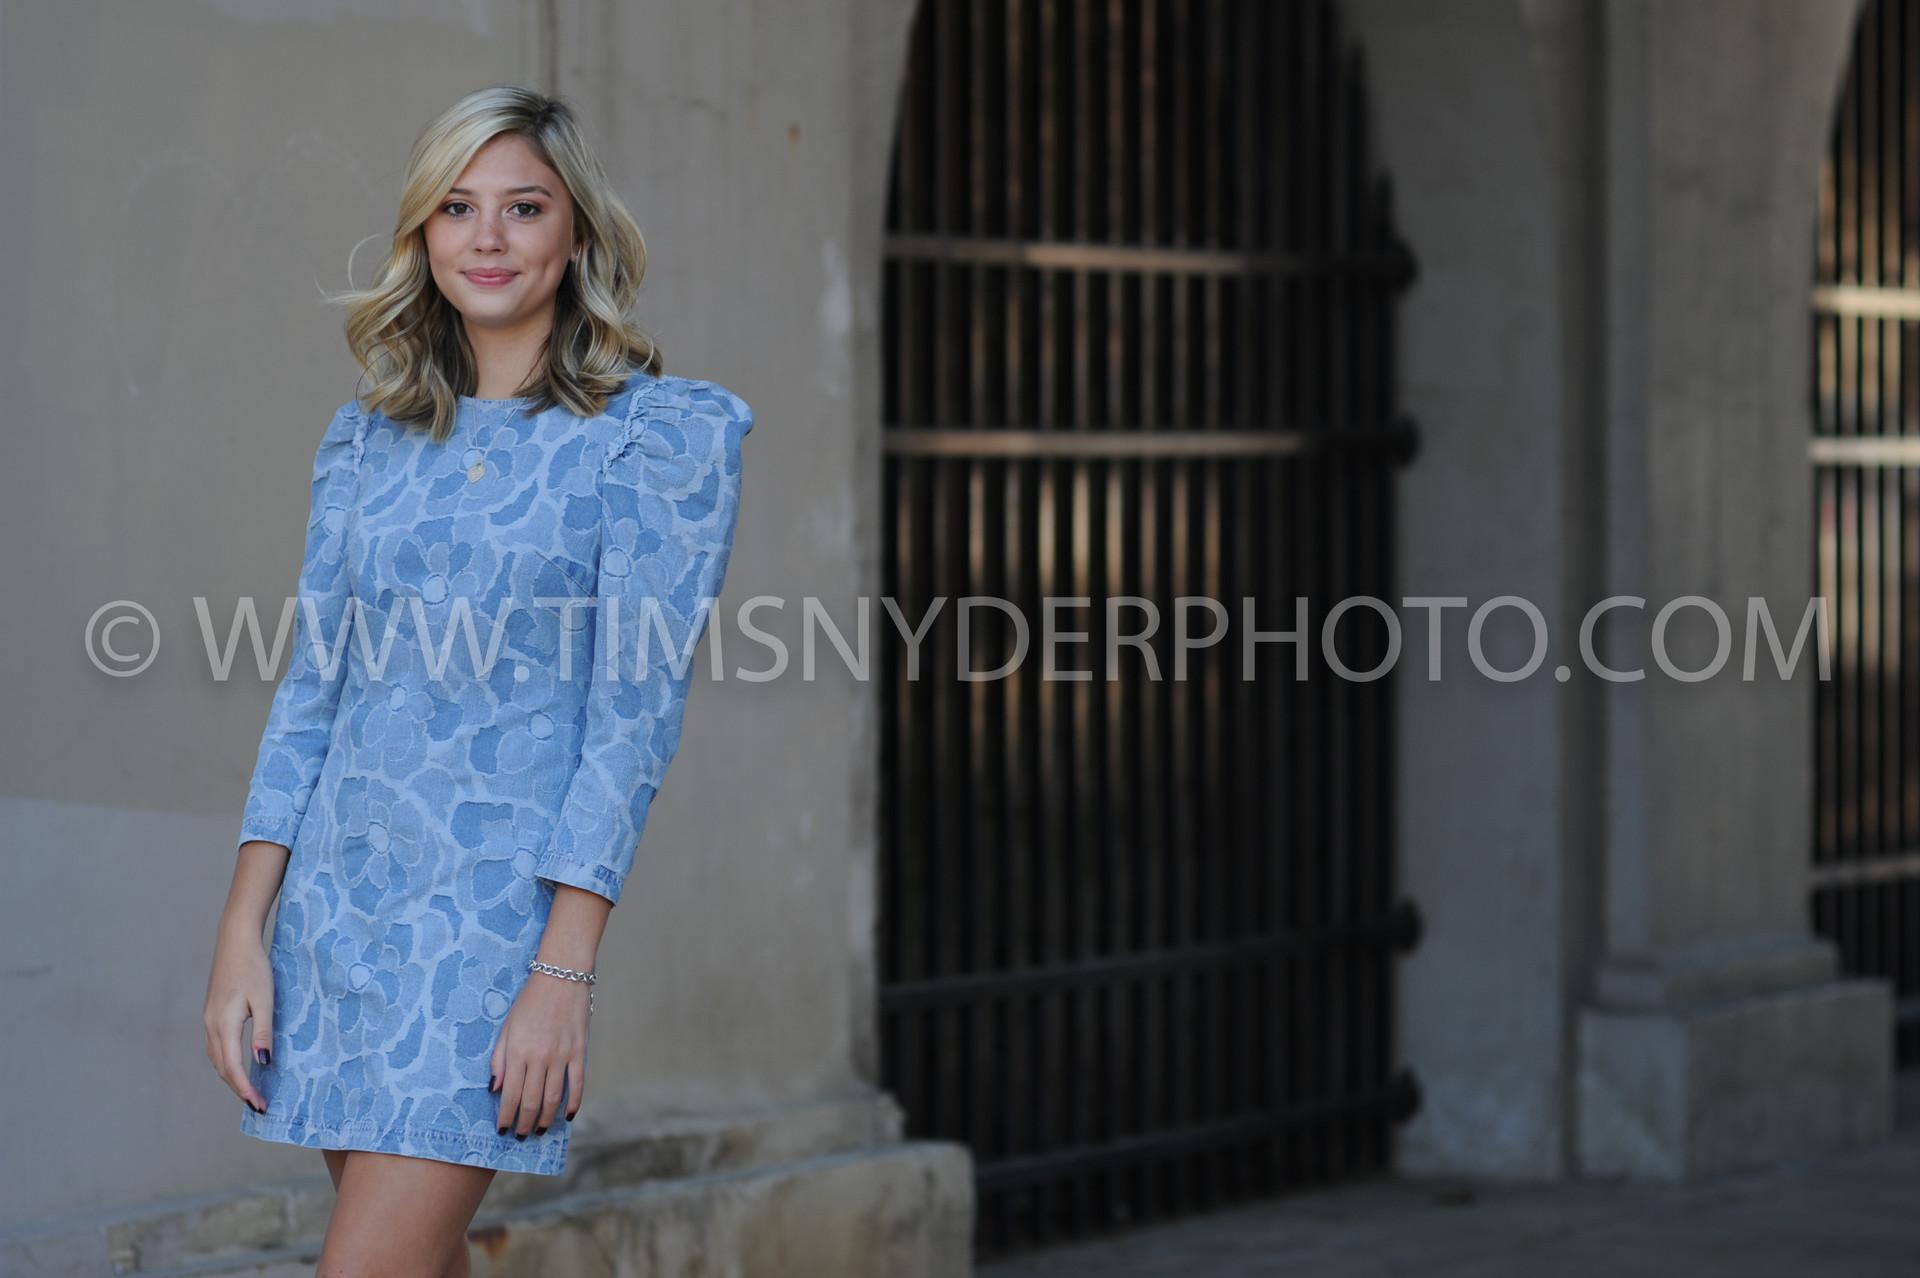 Olivia.Proof.TIMSNYDERPHOTO2019-25.jpg